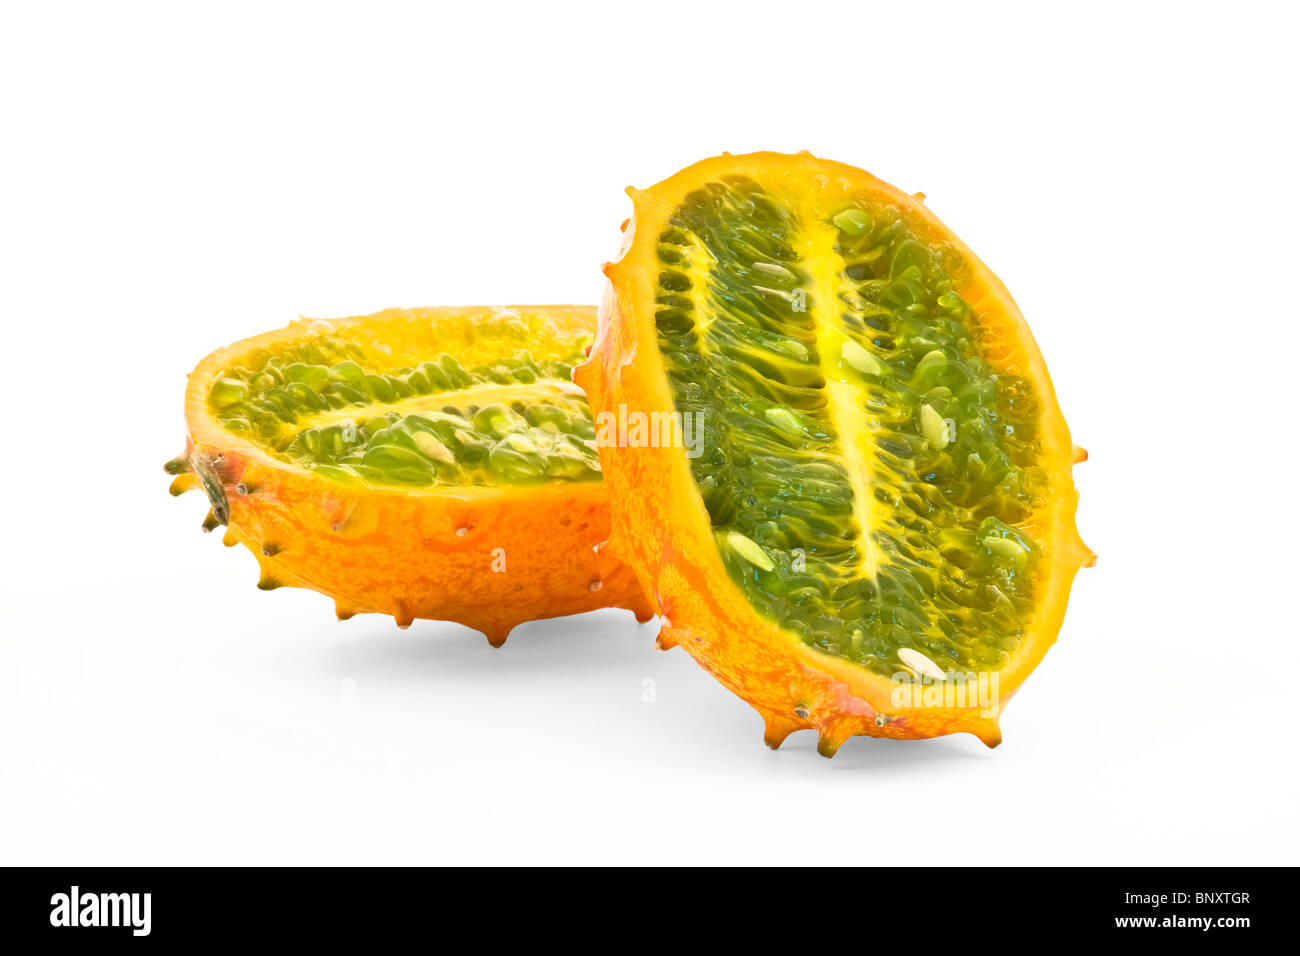 Cucumis metulifera - Kiwano - Horned Melon - Stock Image